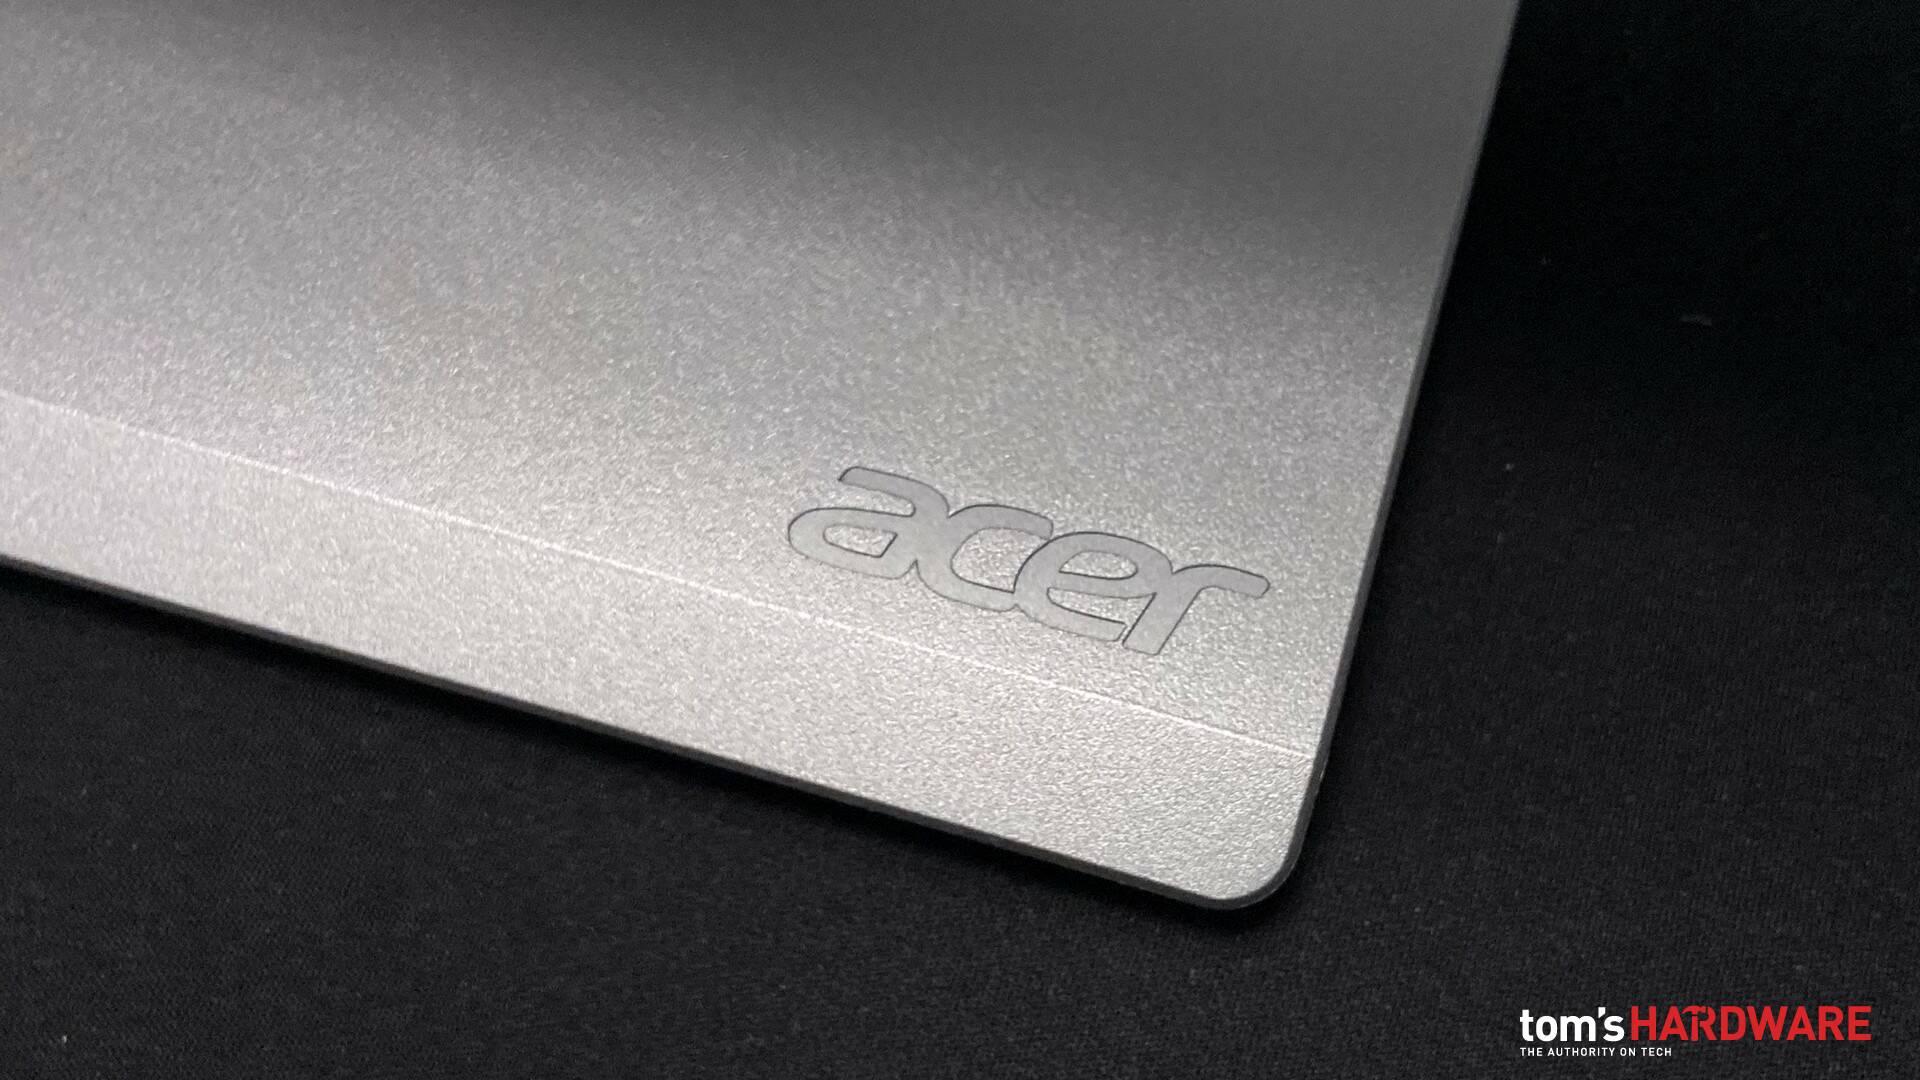 Acer BL270